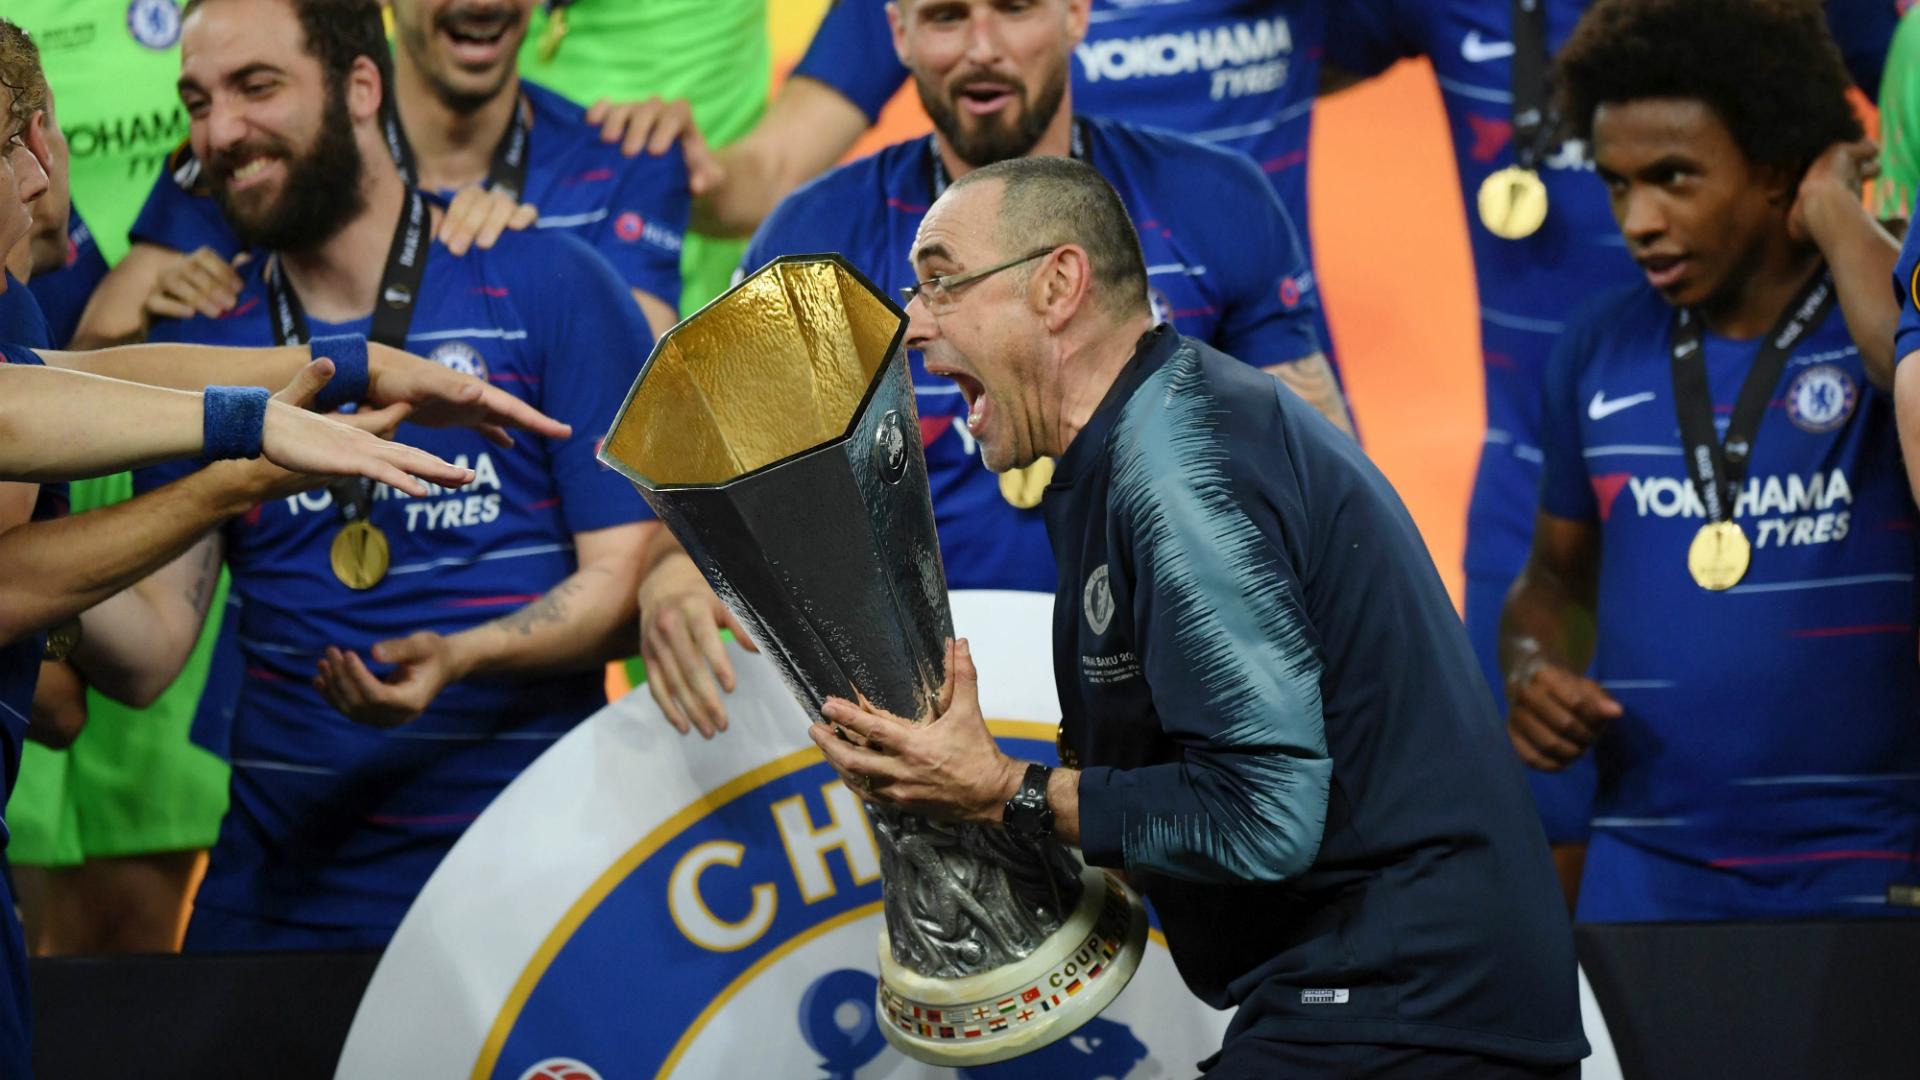 Chelsea mark Lampard anniversary amid Sarri to Juventus reports